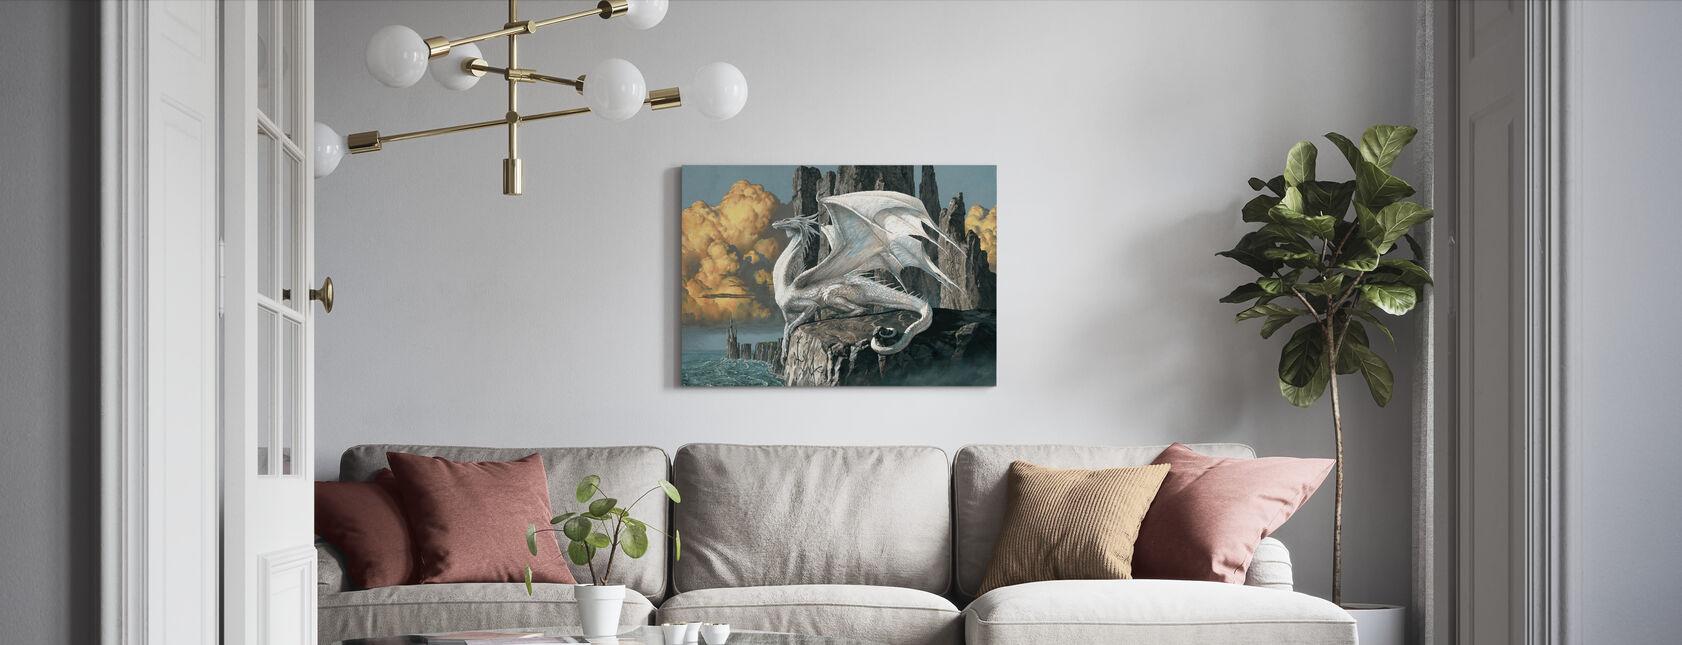 Hobsyllwin - Canvas print - Living Room